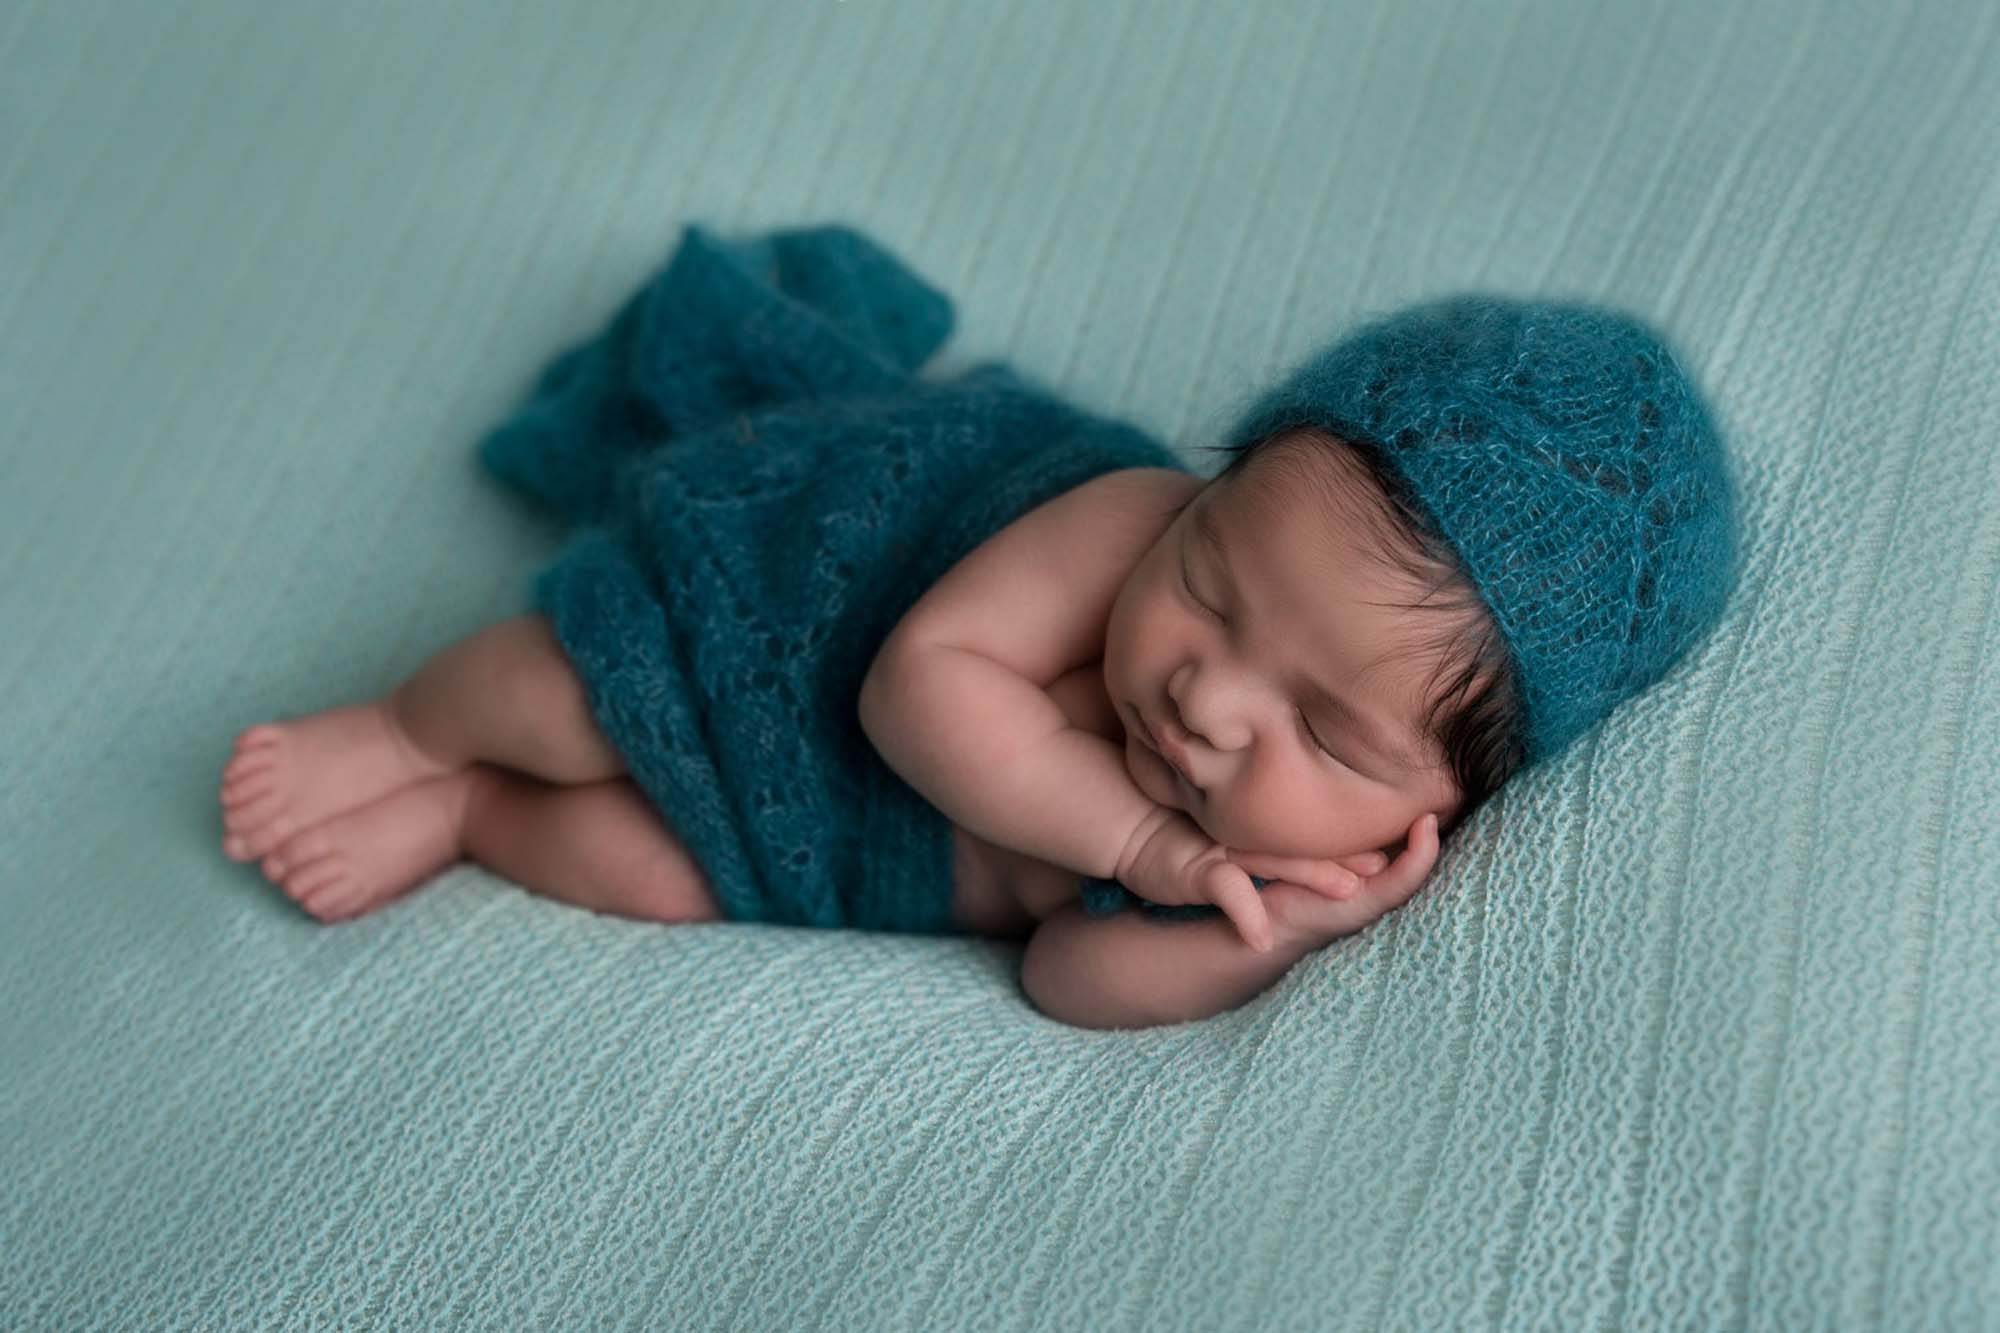 newborn little boy in side pose in green hat on a green blanket background